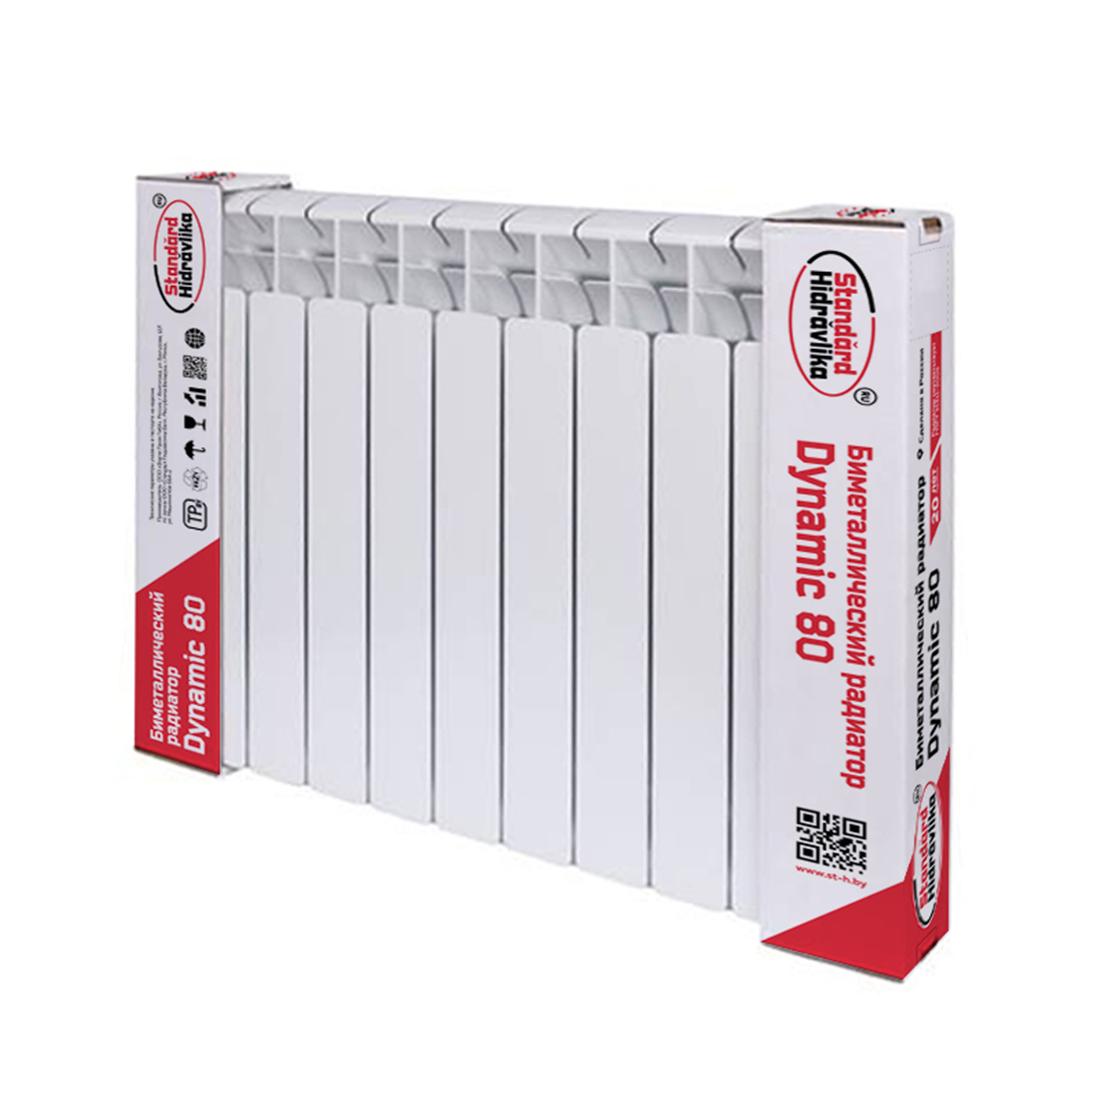 Биметаллический радиатор  Dynamic 80   1 cекция Standard Hidravlika